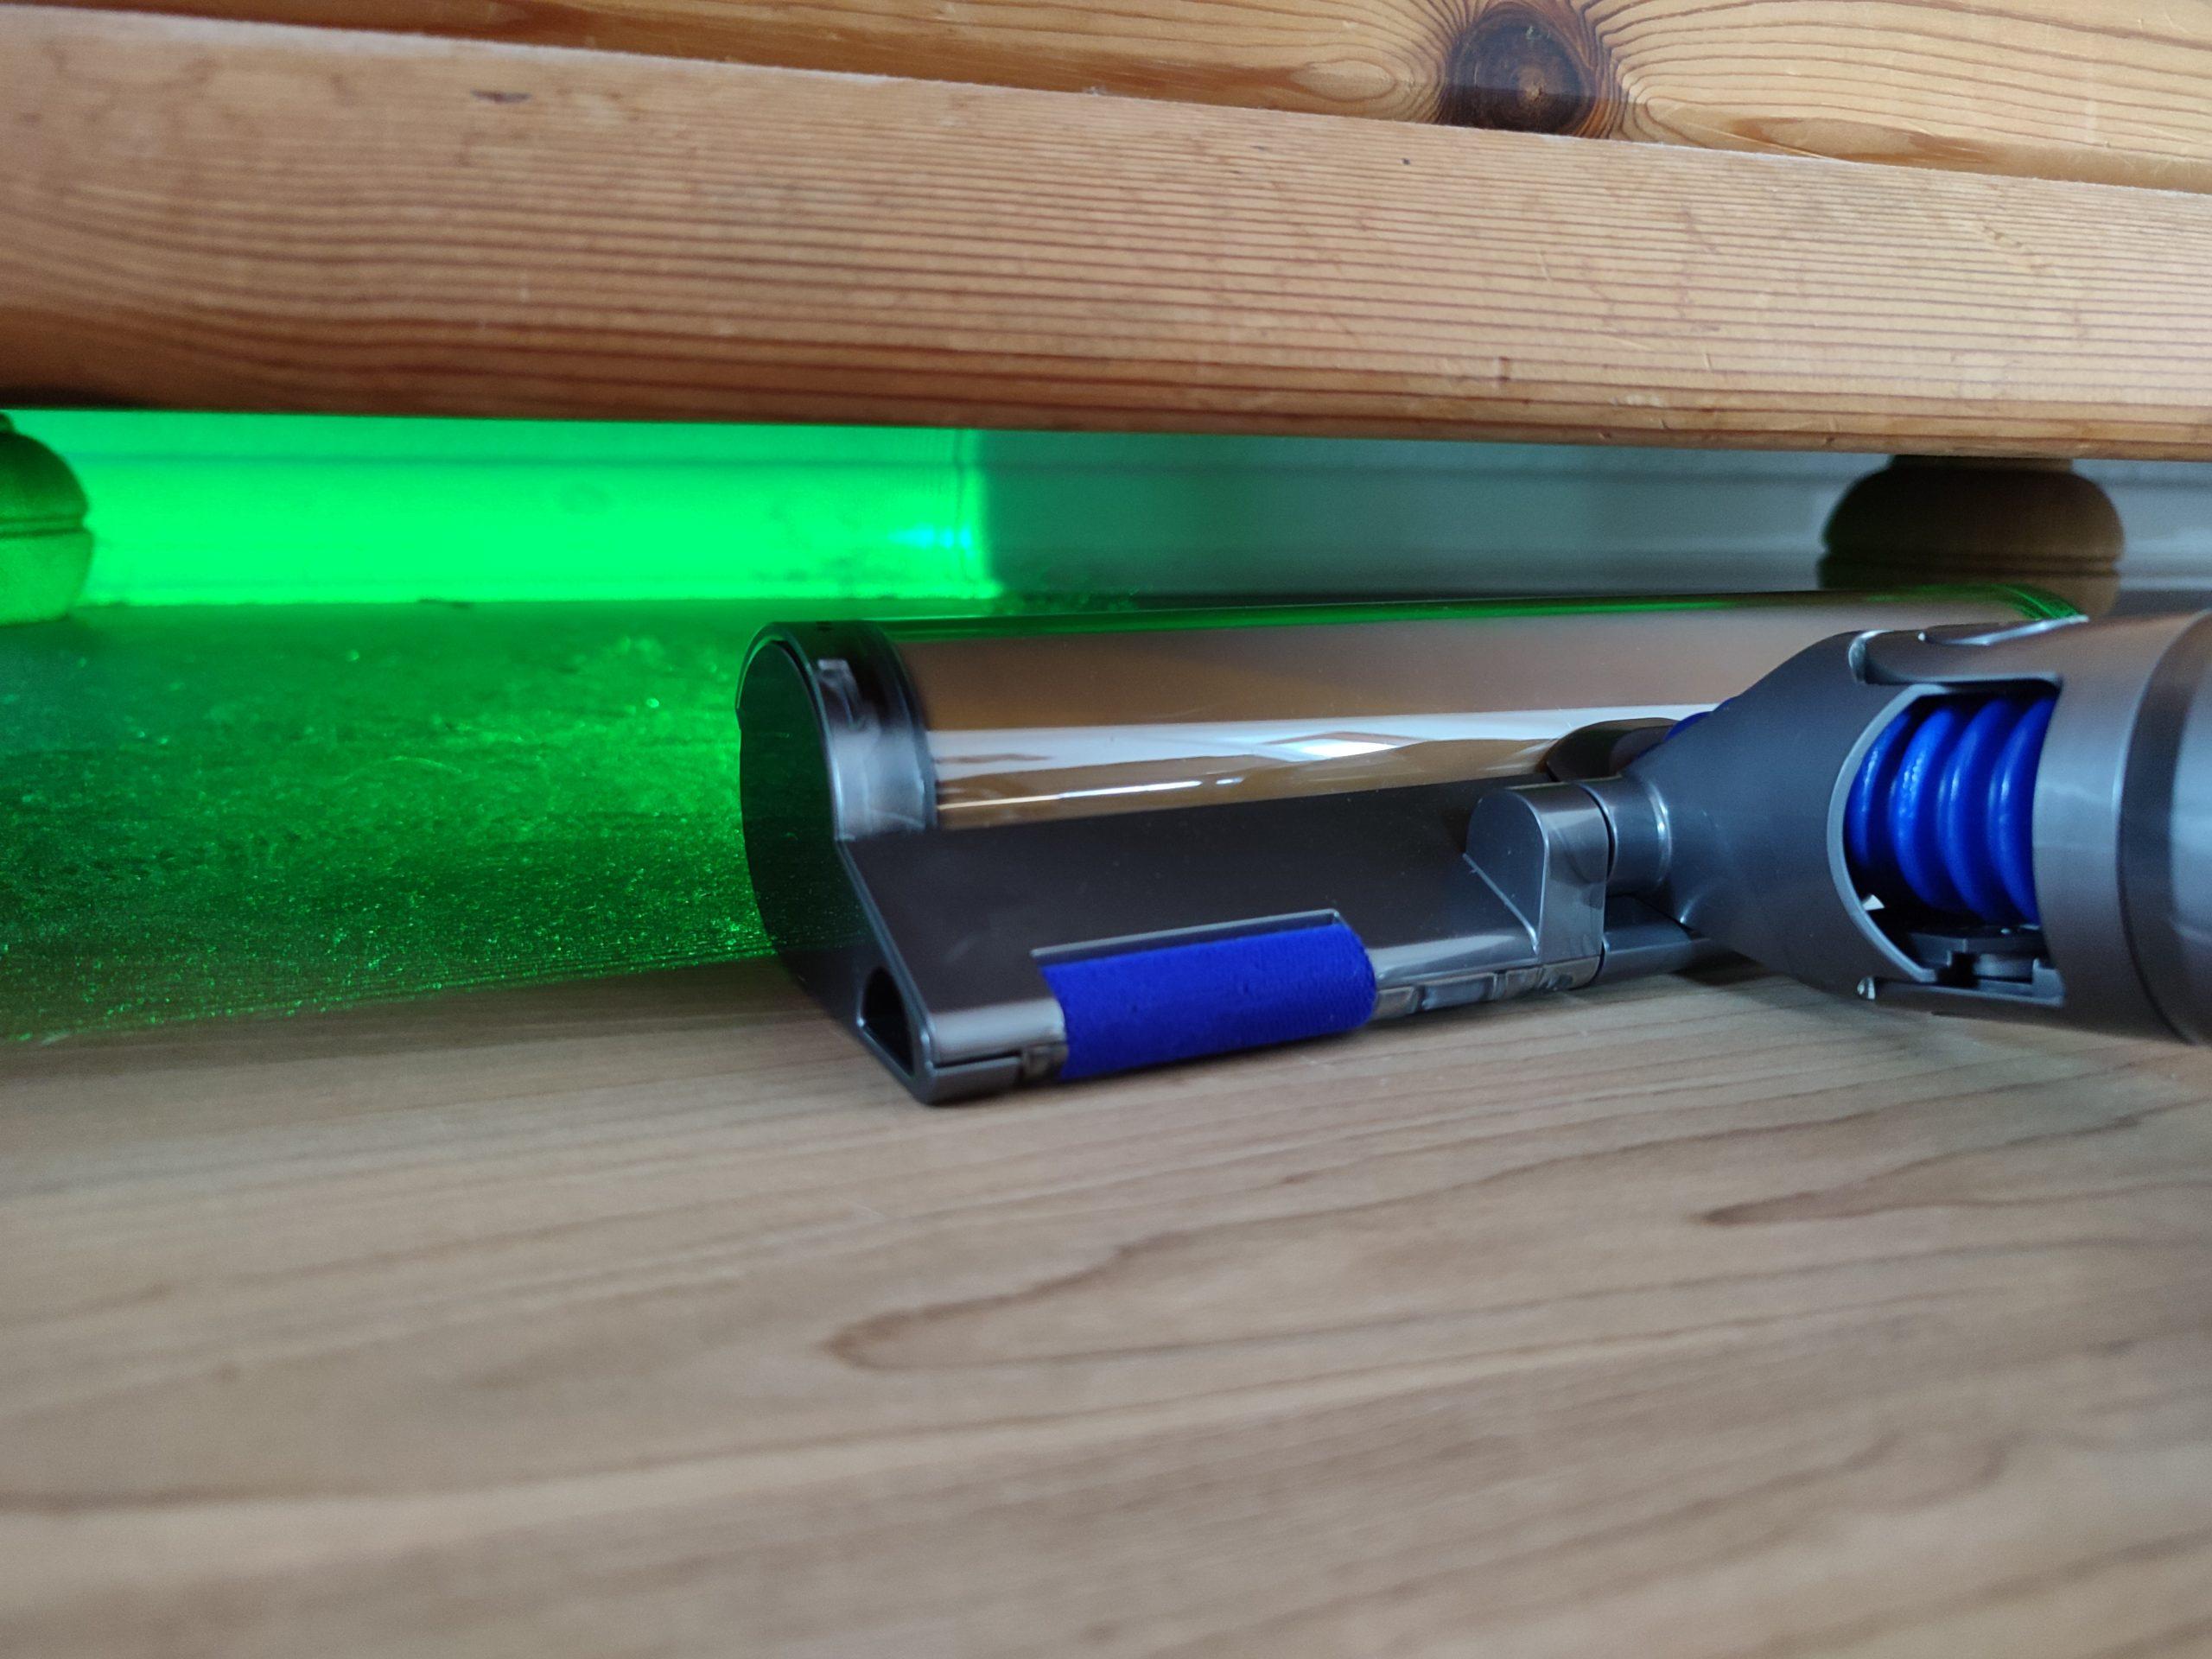 Dyson V15 Detect Akkusauger Laser-Erkennung